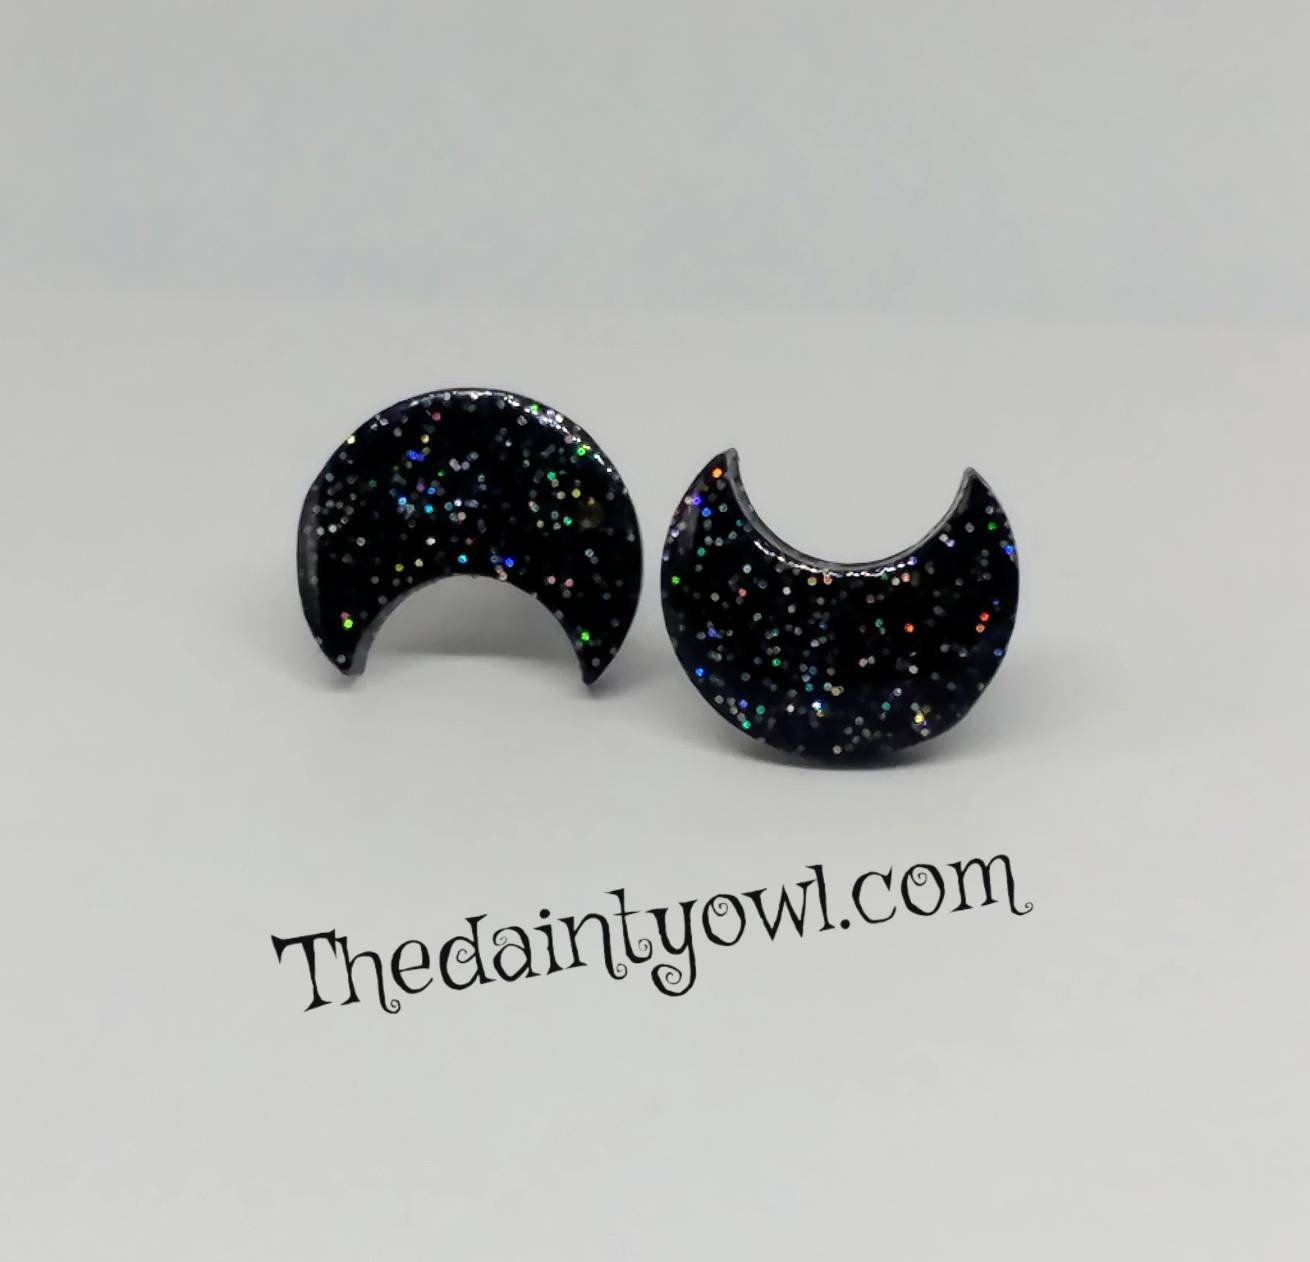 Earrings silver half moon black sequin